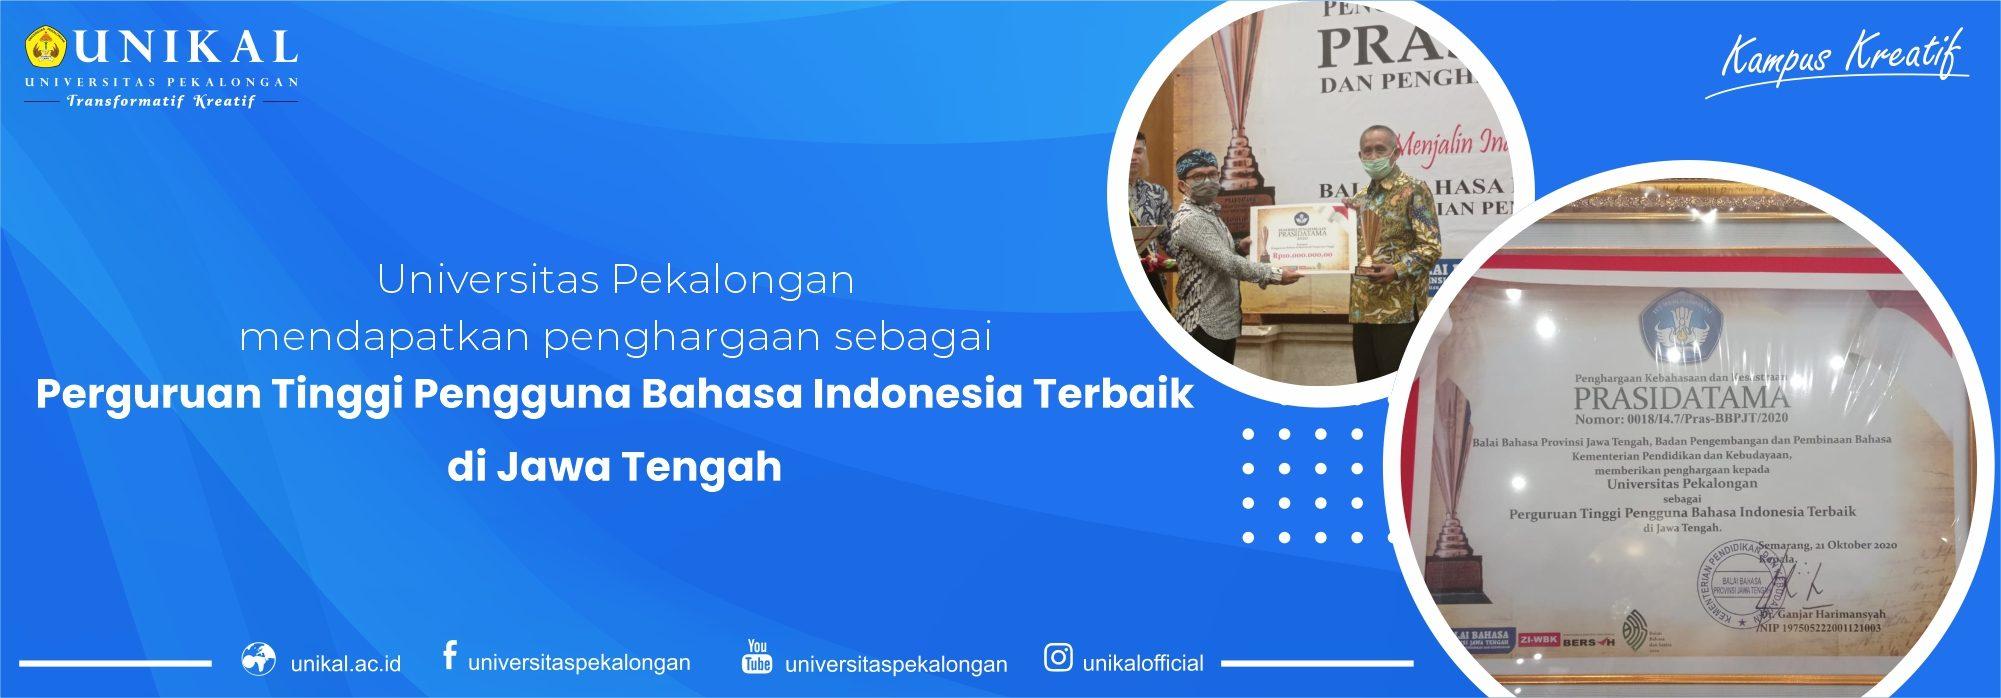 unikal sebagai perguruan tinggi pengguna bahasa indonesia terbaik